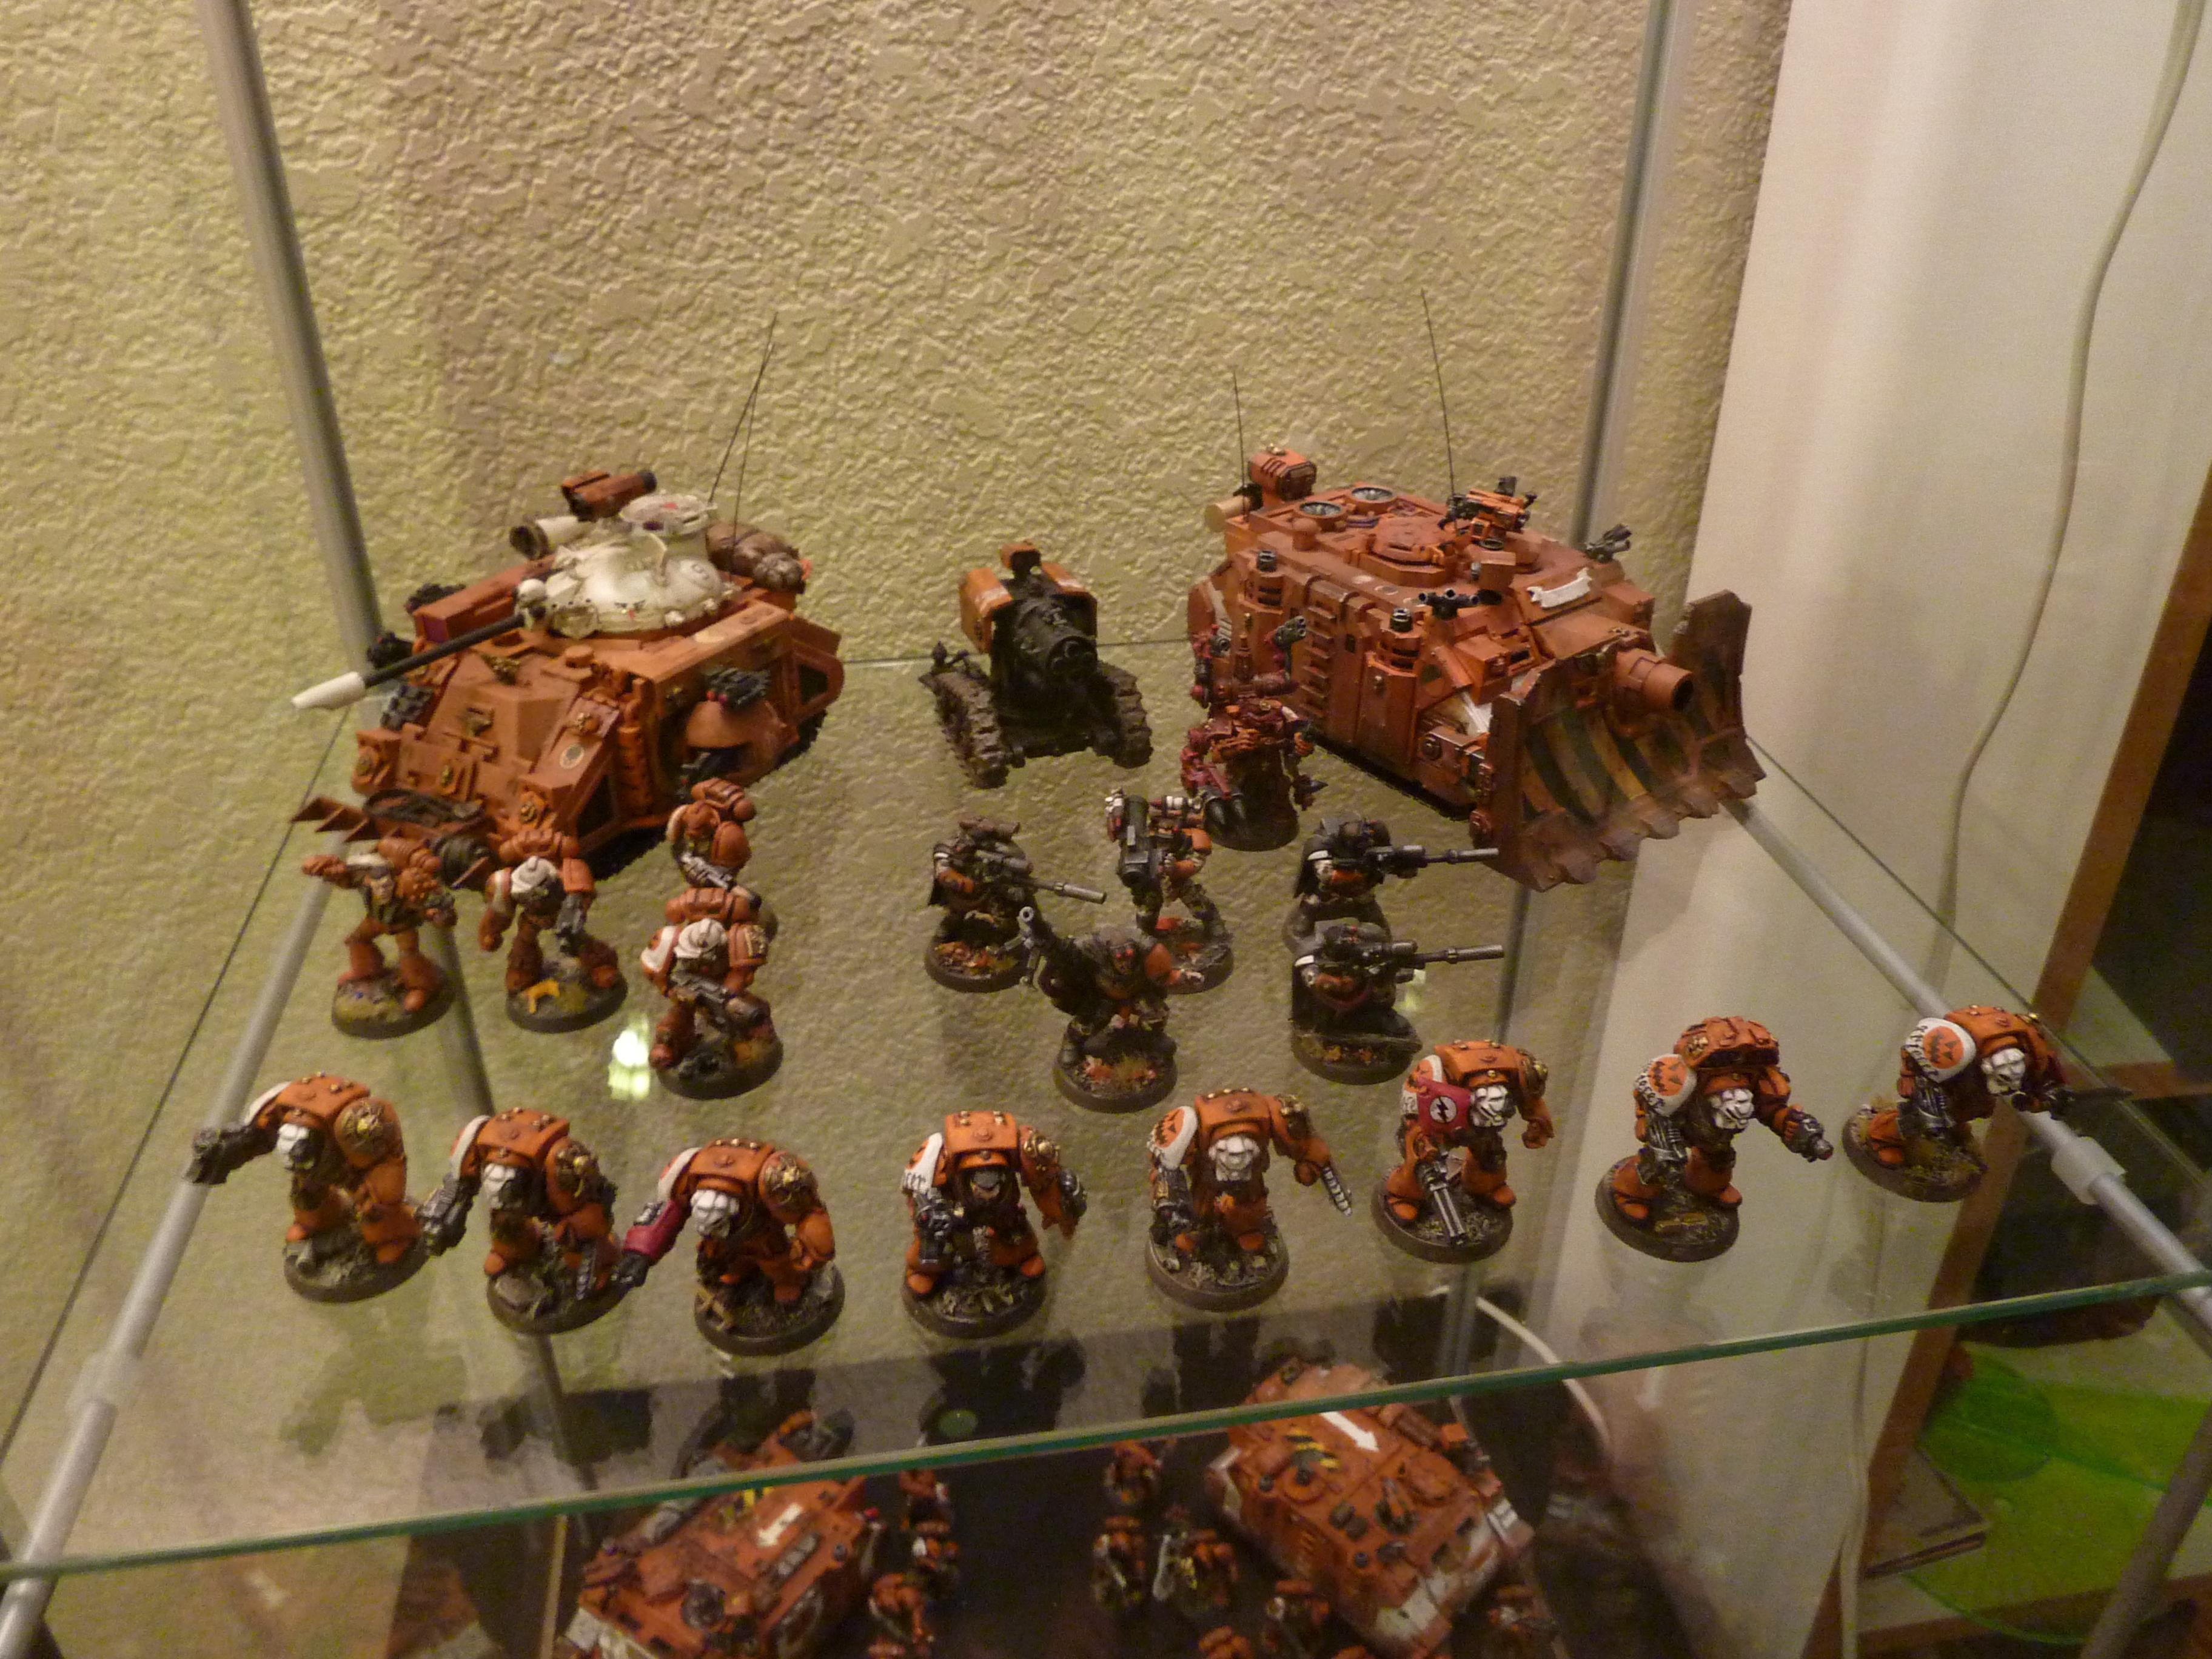 Cavedweller, Cave_dweller, Space Marines, Warhammer 40,000